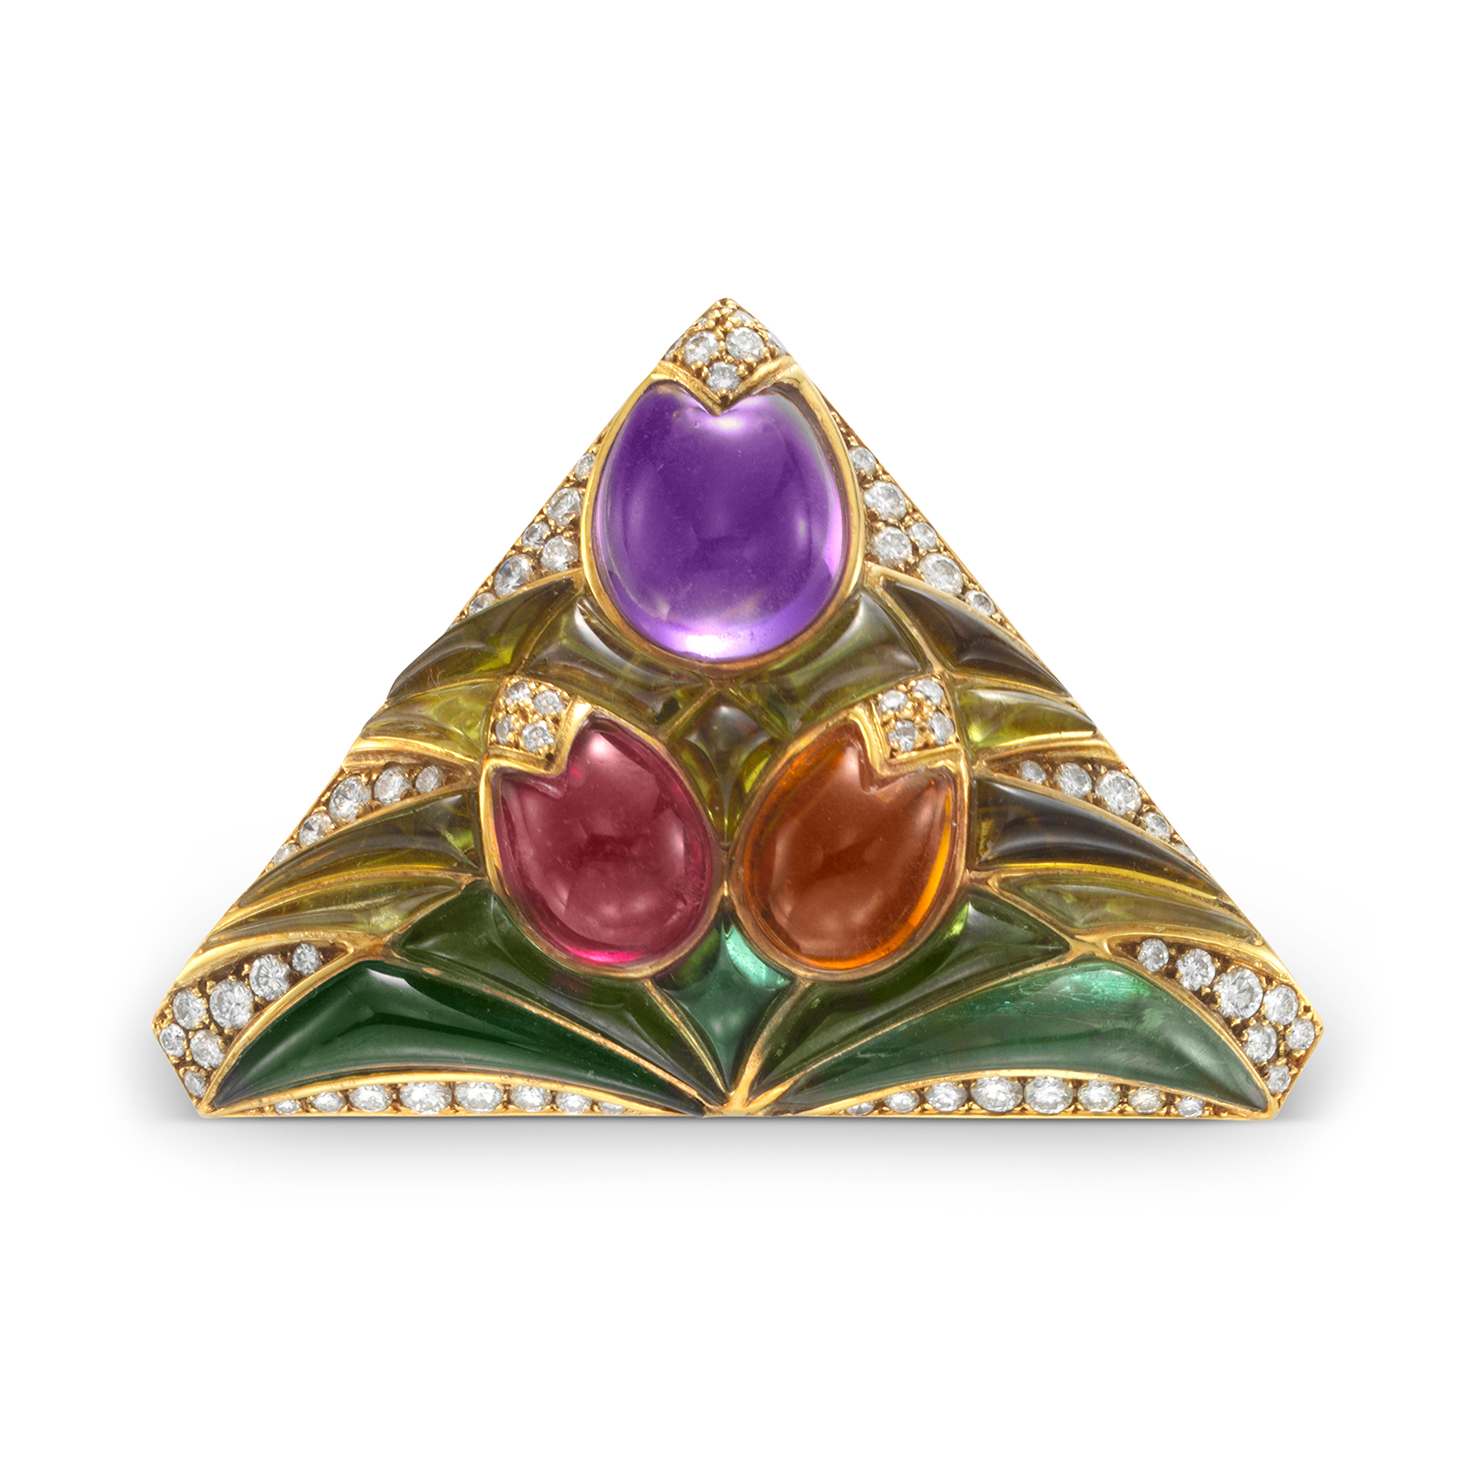 A Multi-gem and Diamond Flower Brooch, by Bulgari, circa 1980